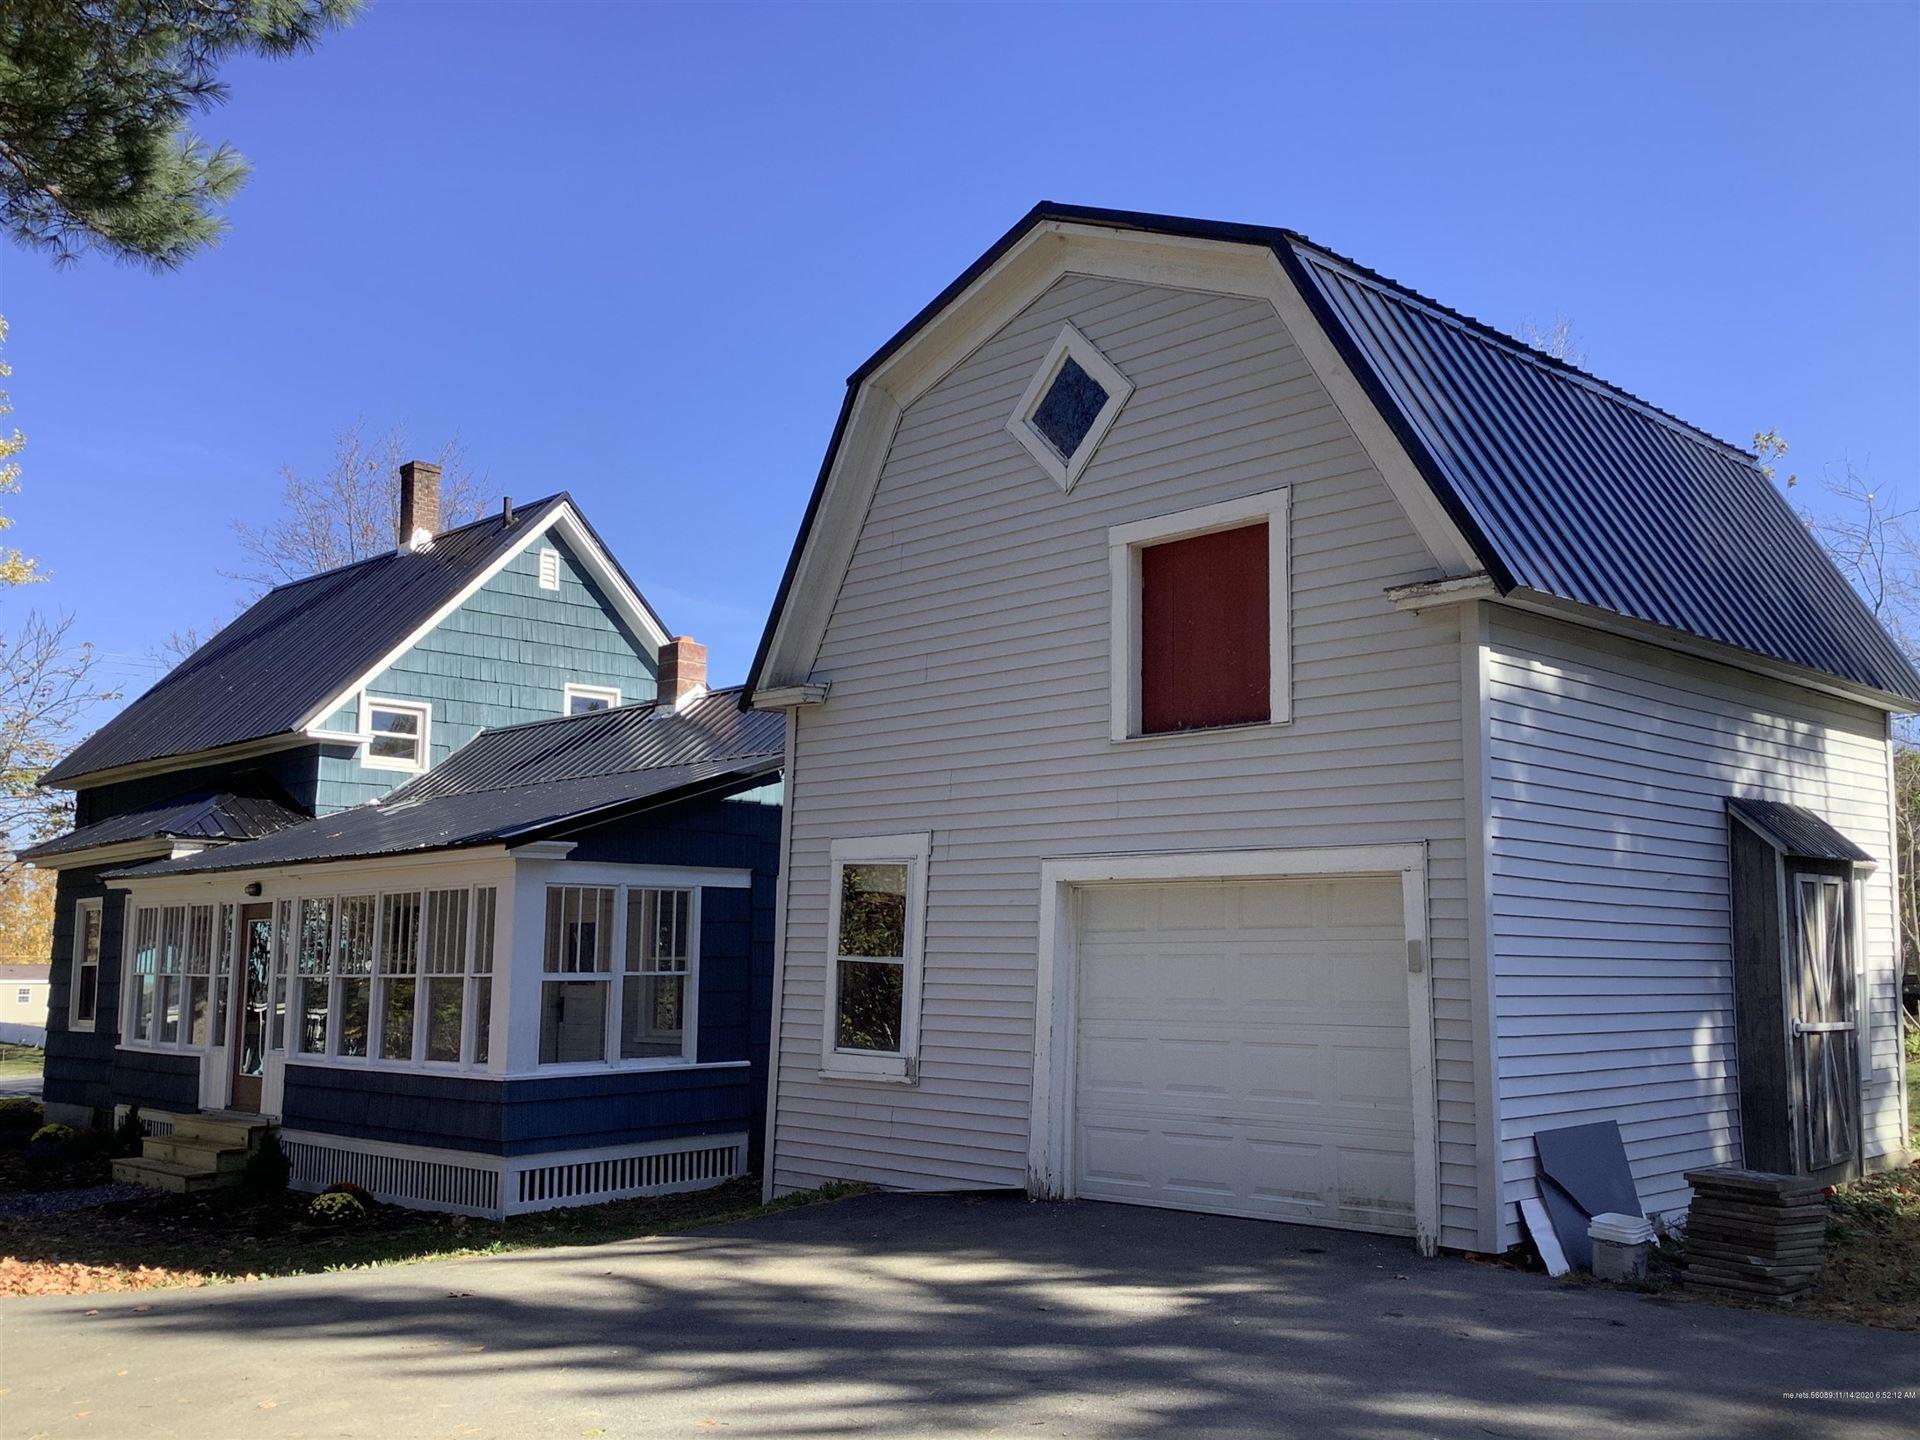 Photo of 46 Blake Street, Presque Isle, ME 04769 (MLS # 1473155)